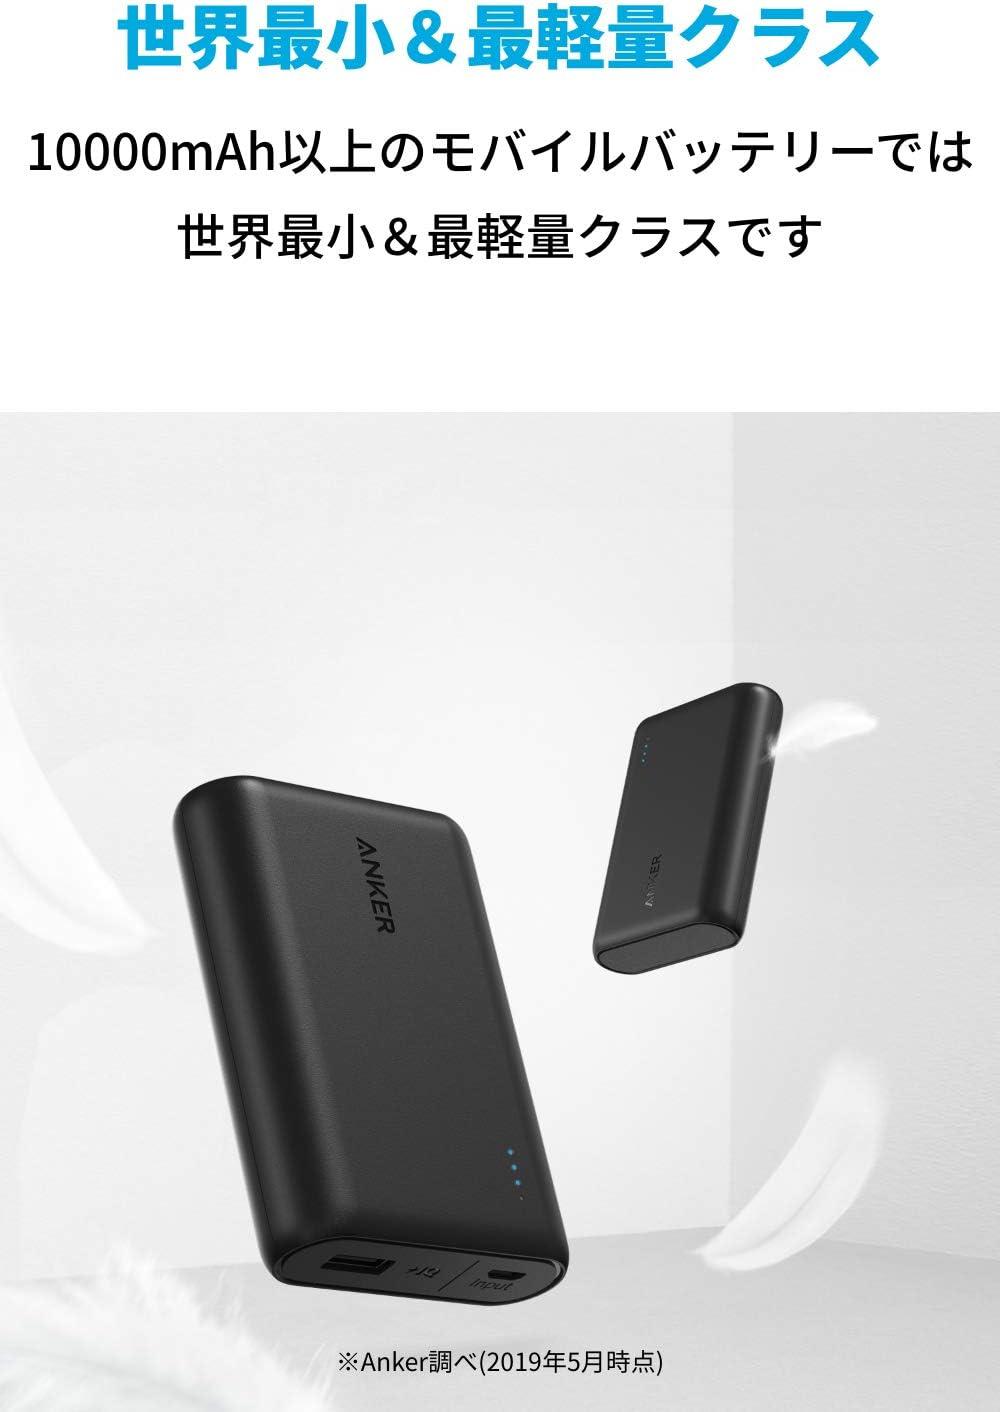 Anker PowerCore 10000(機能)